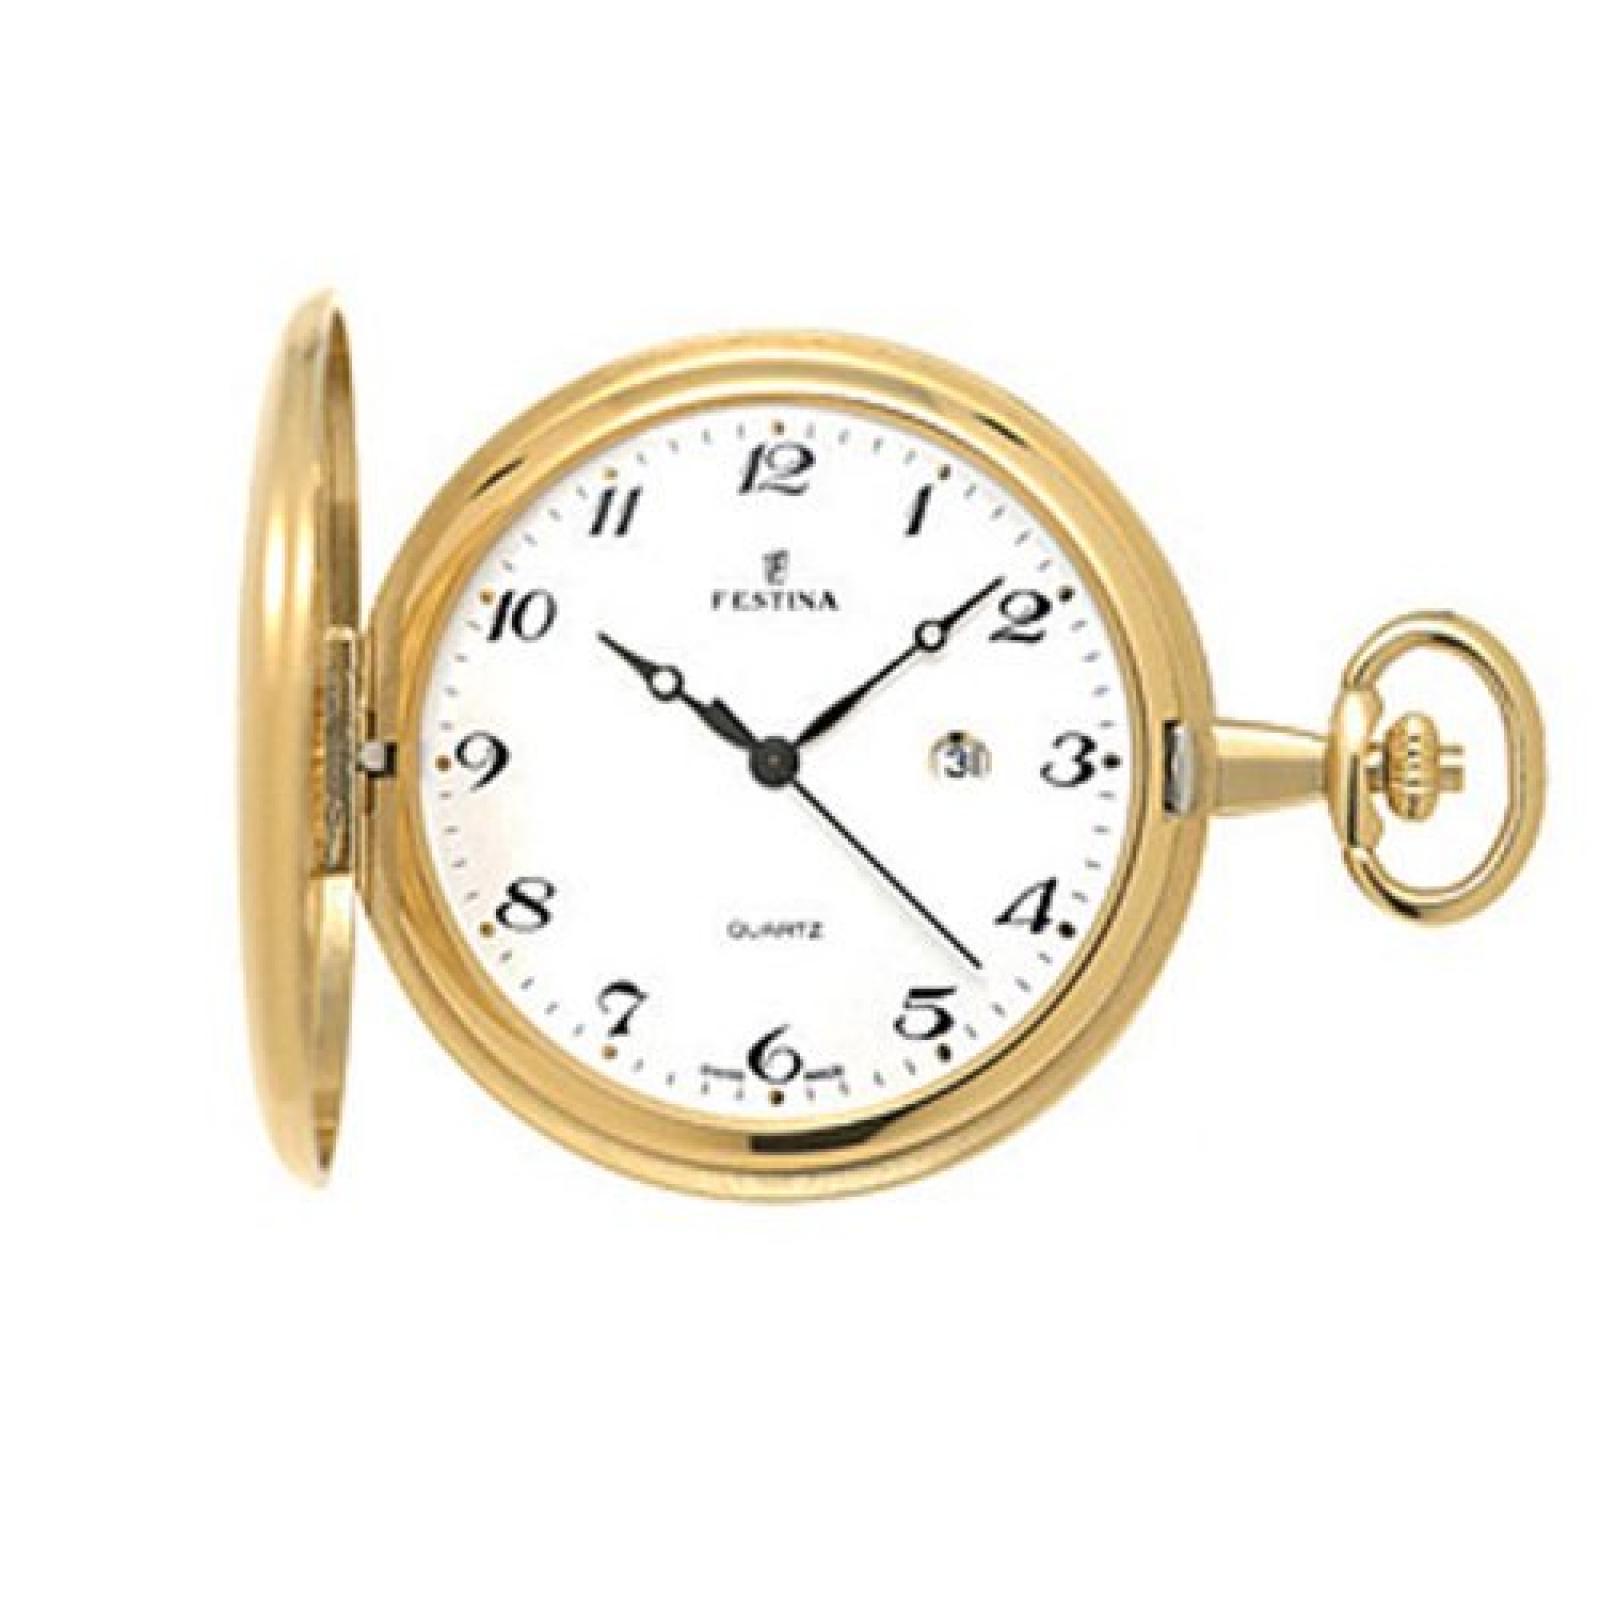 Festina Herren-Armbanduhr XL Klassik Taschenuhren vergoldet Analog Edelstahl beschichtet F2009/1